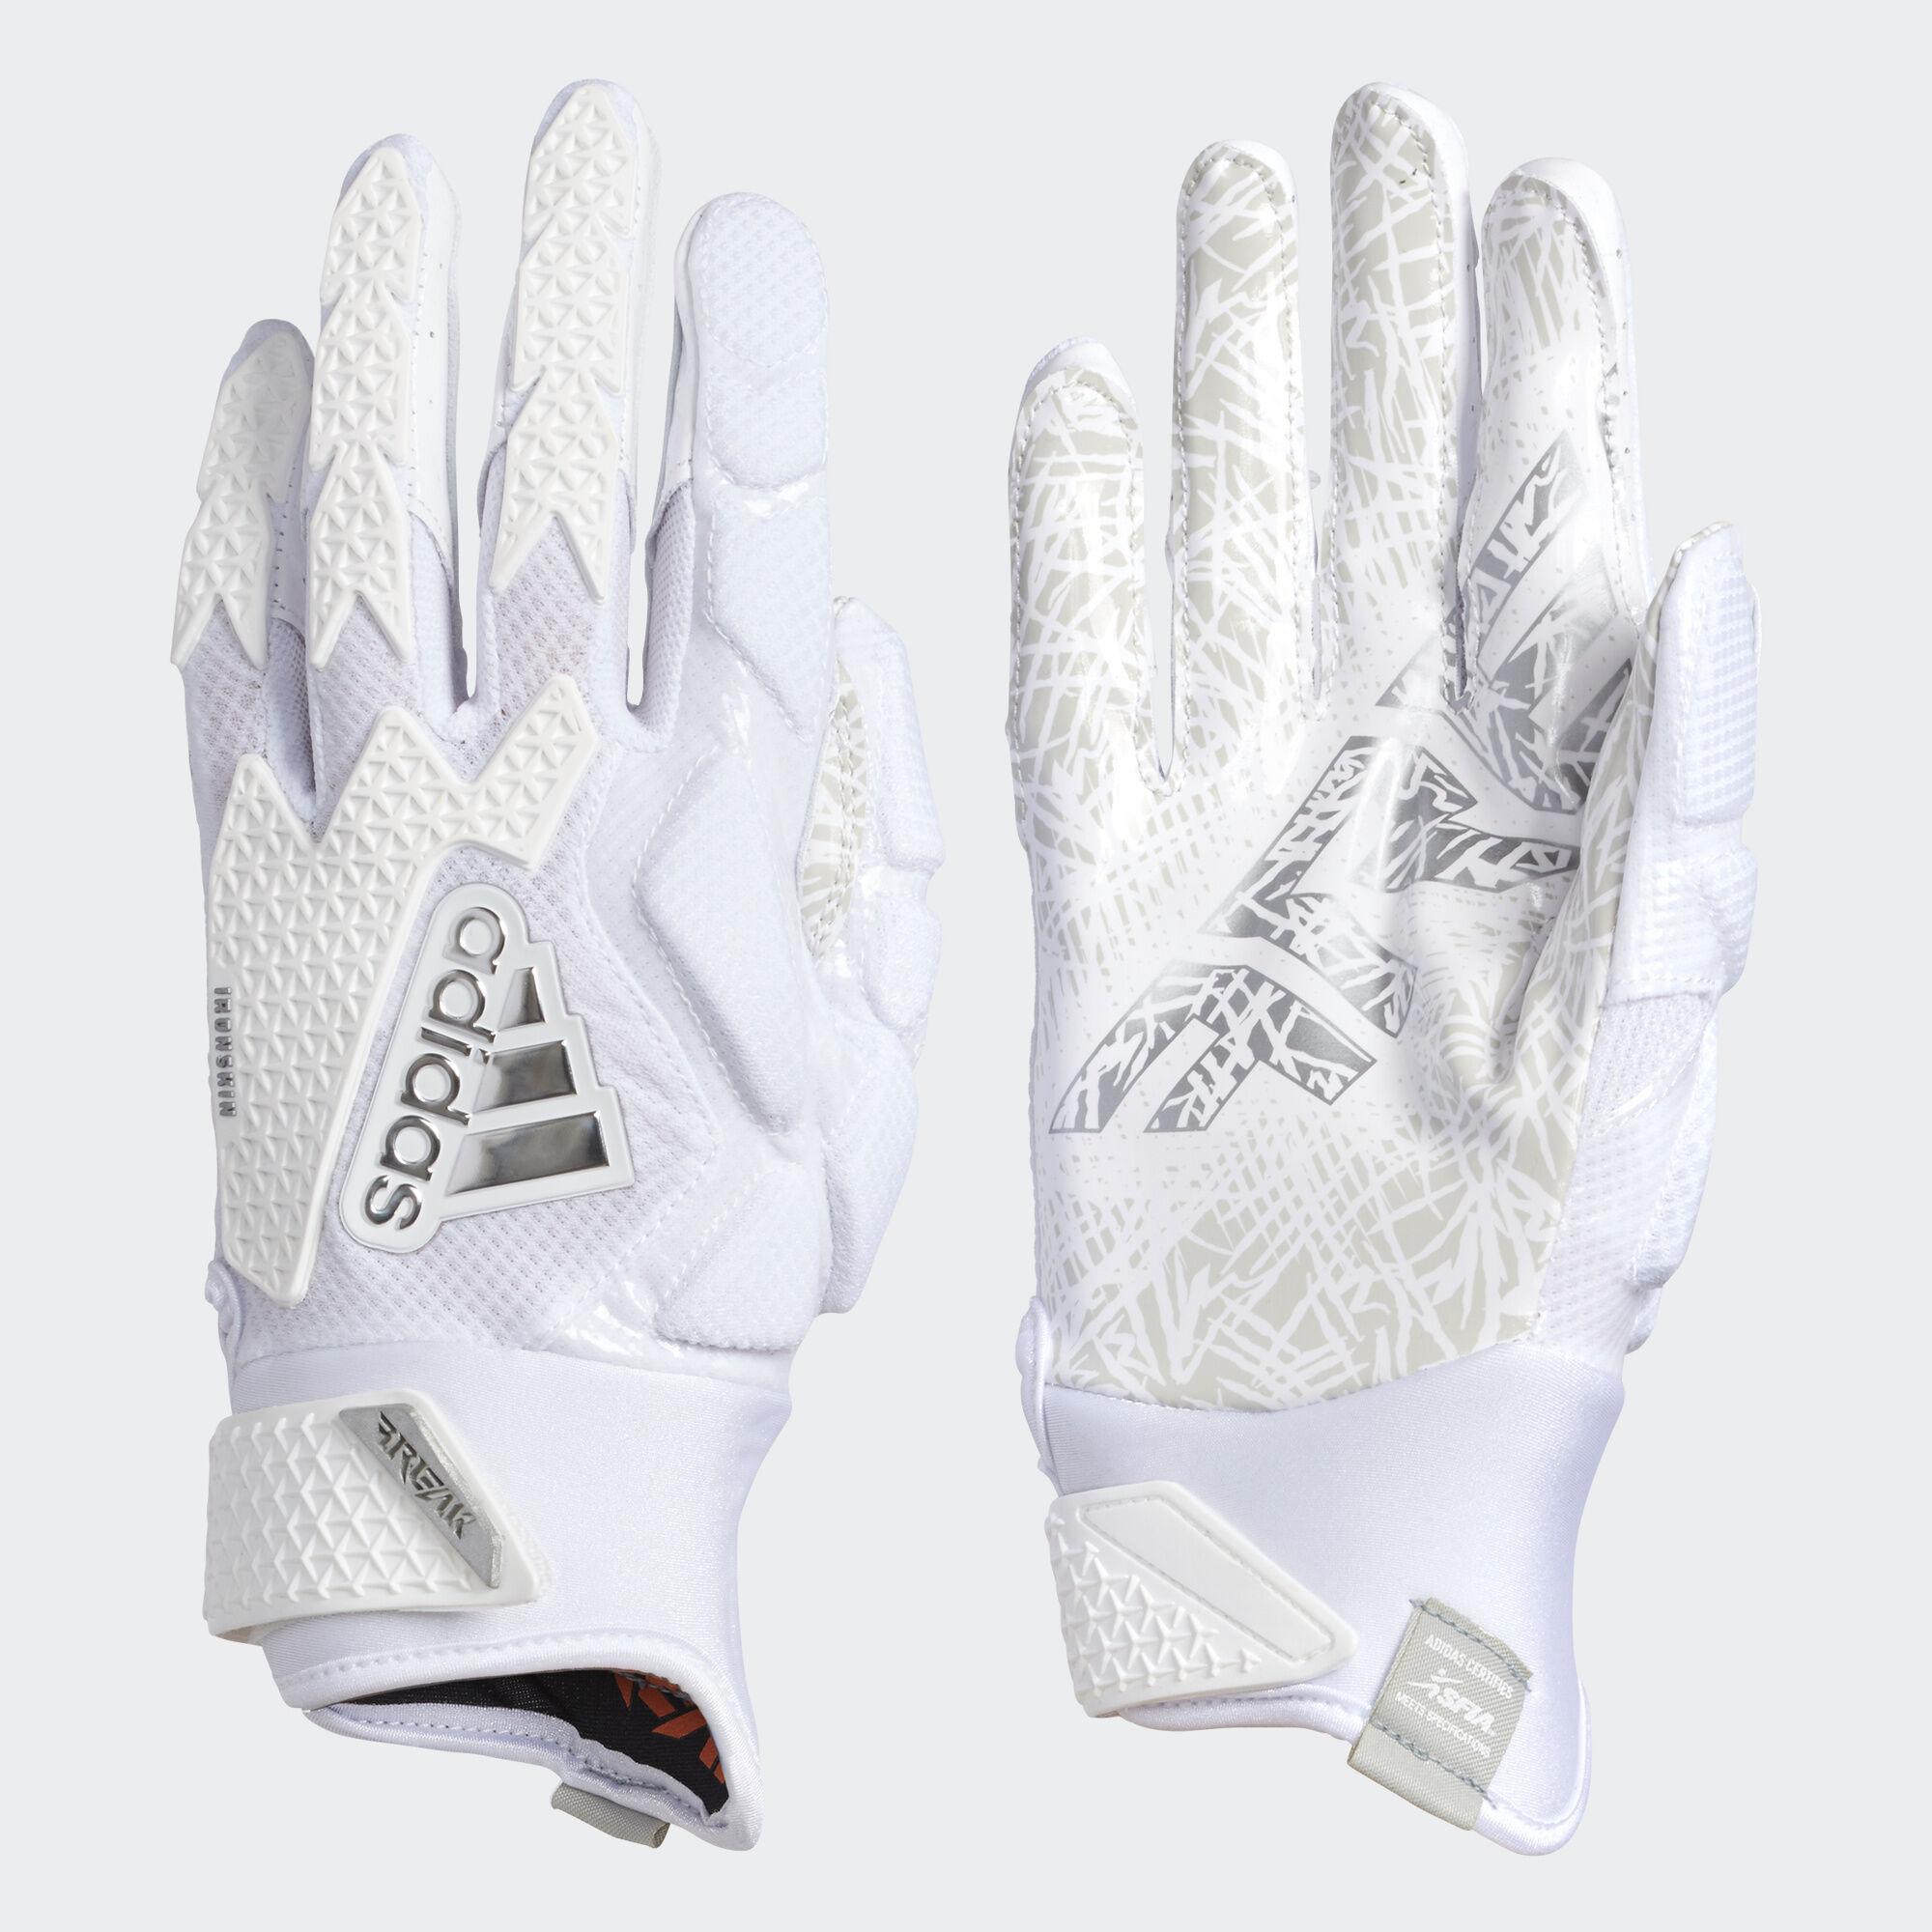 Mens gloves old navy - Adidas Freak 3 0 White Ch9095